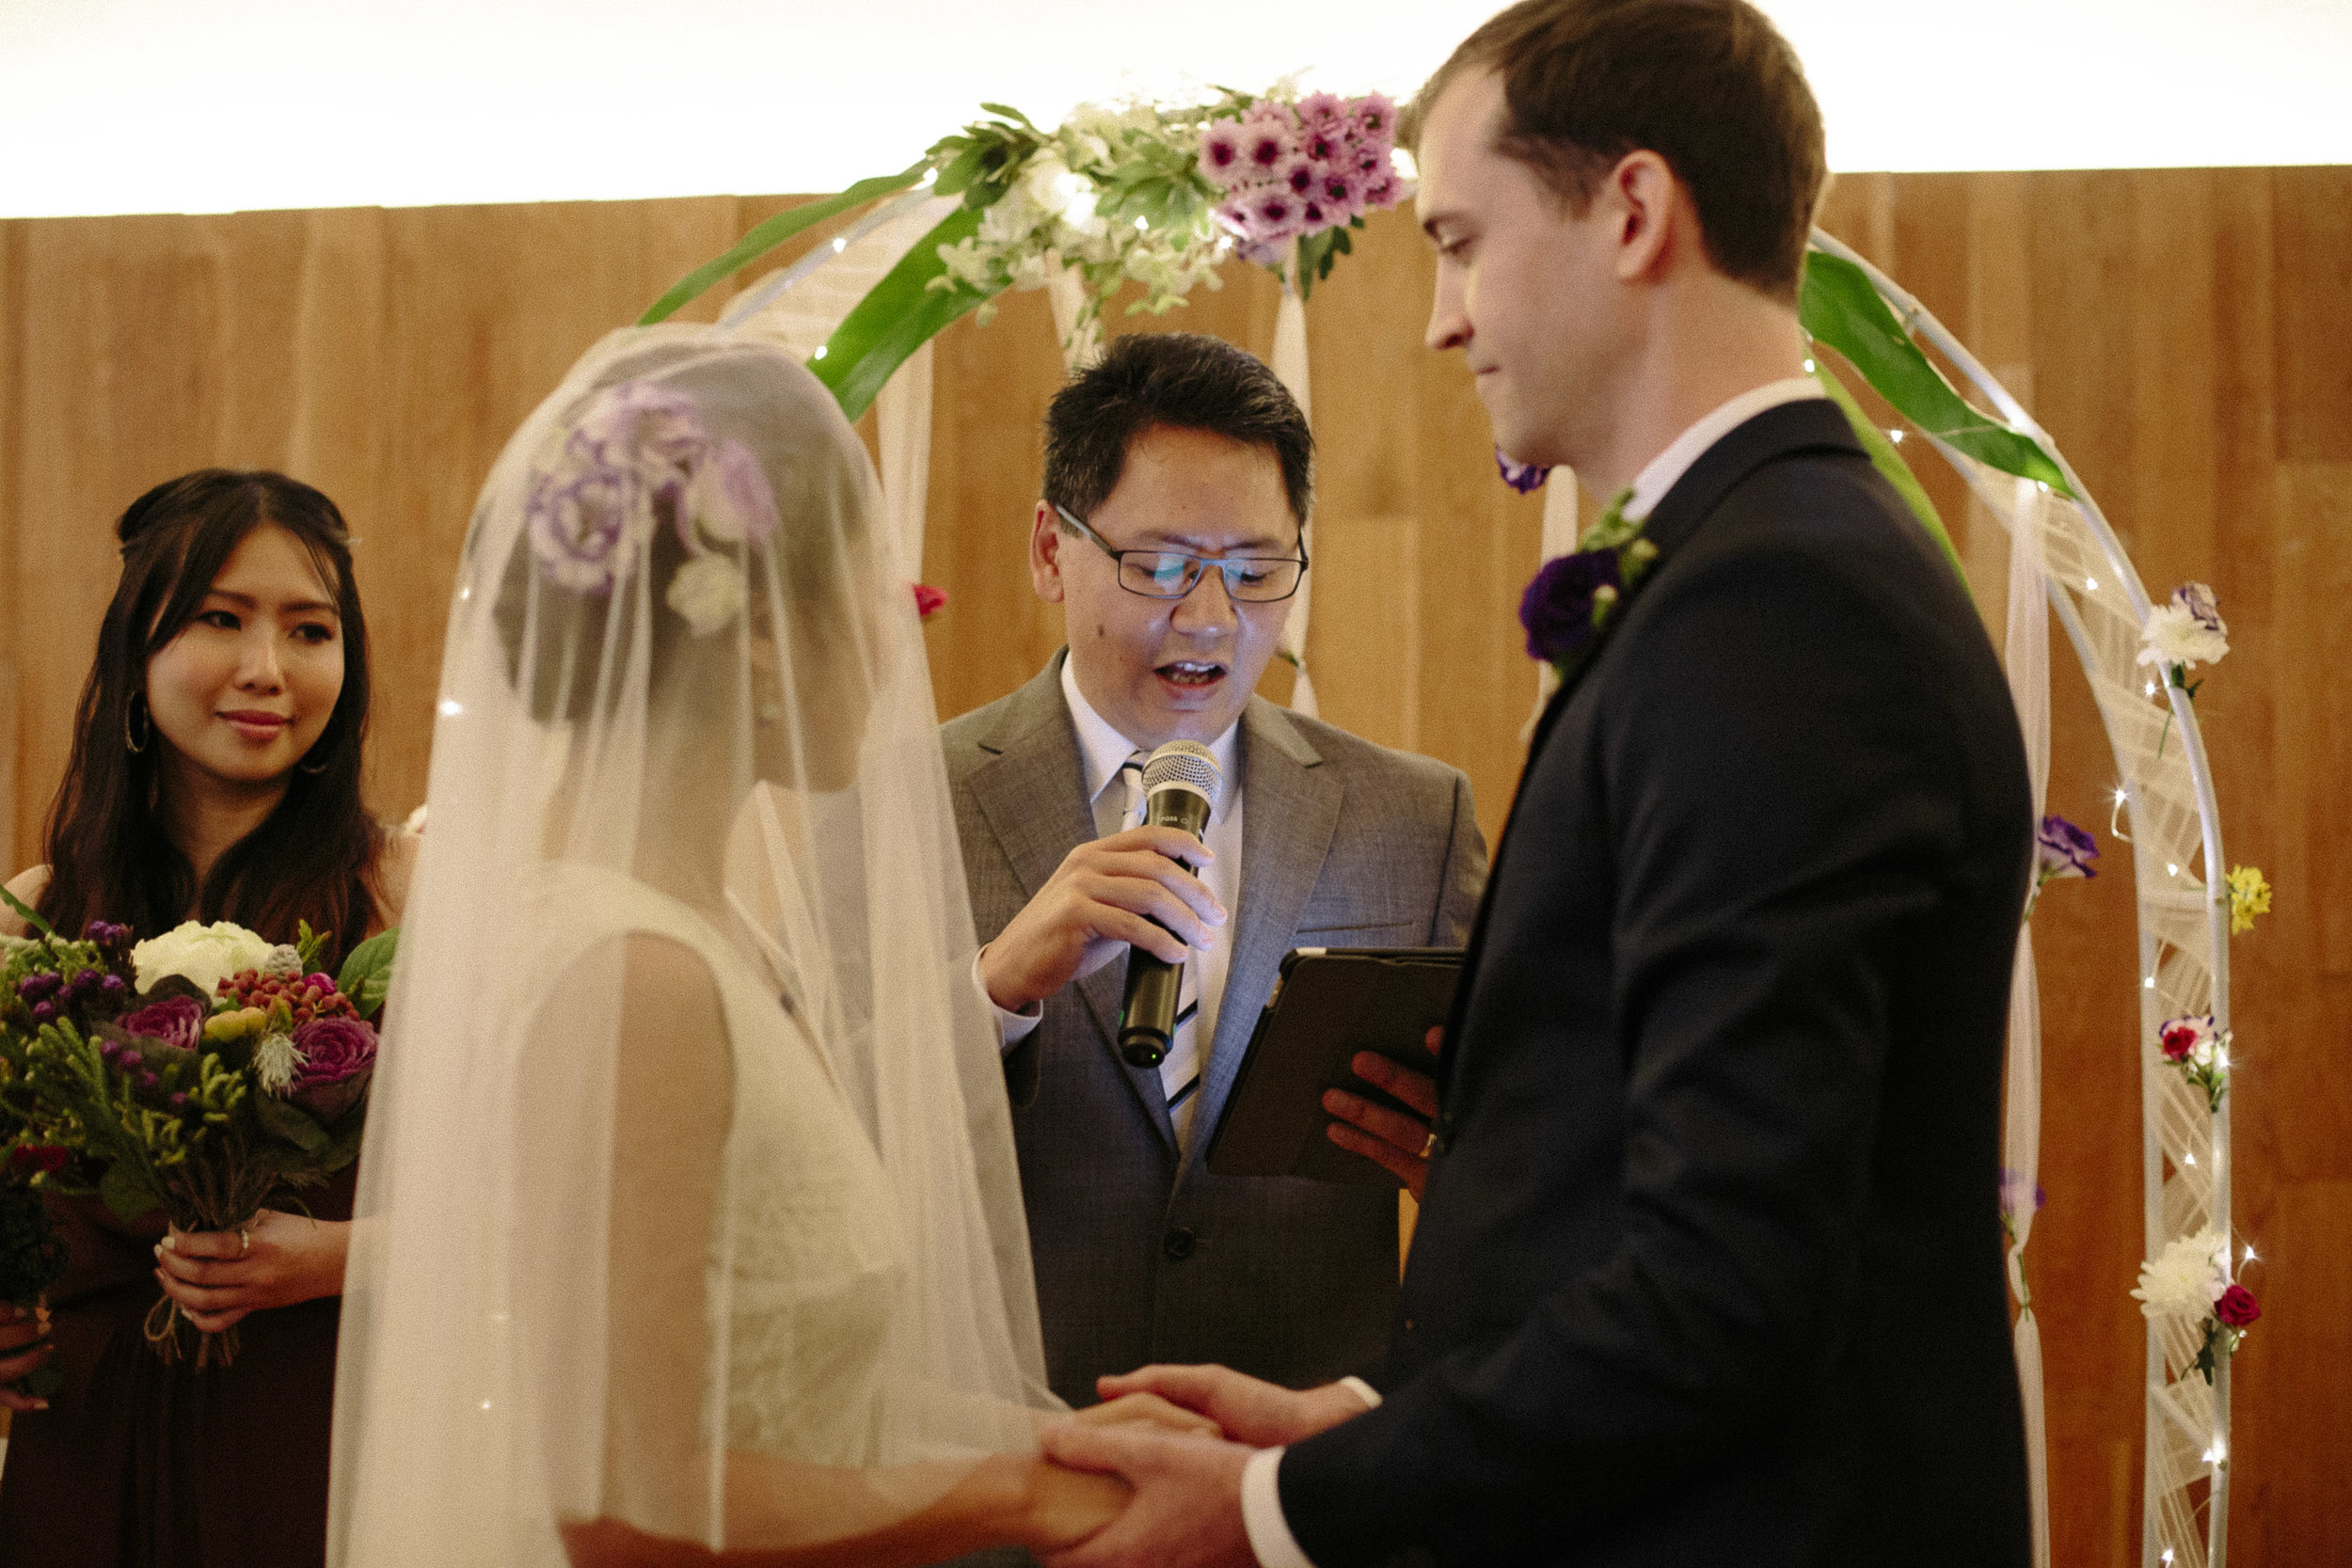 singapore-wedding-photographer-hiram-joyce-038.jpg